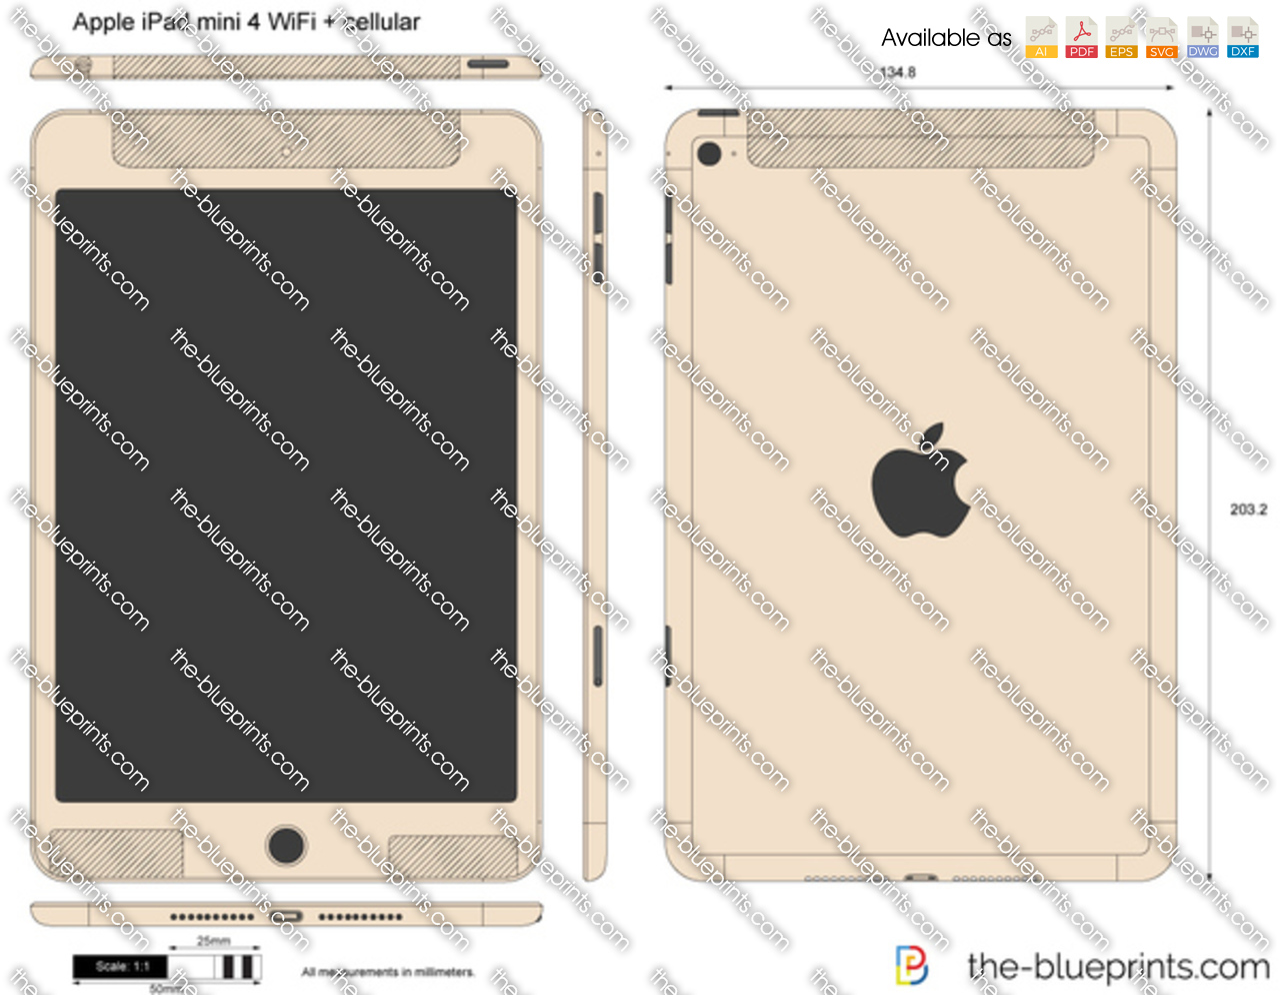 Apple iPad mini 4 WiFi + cellular